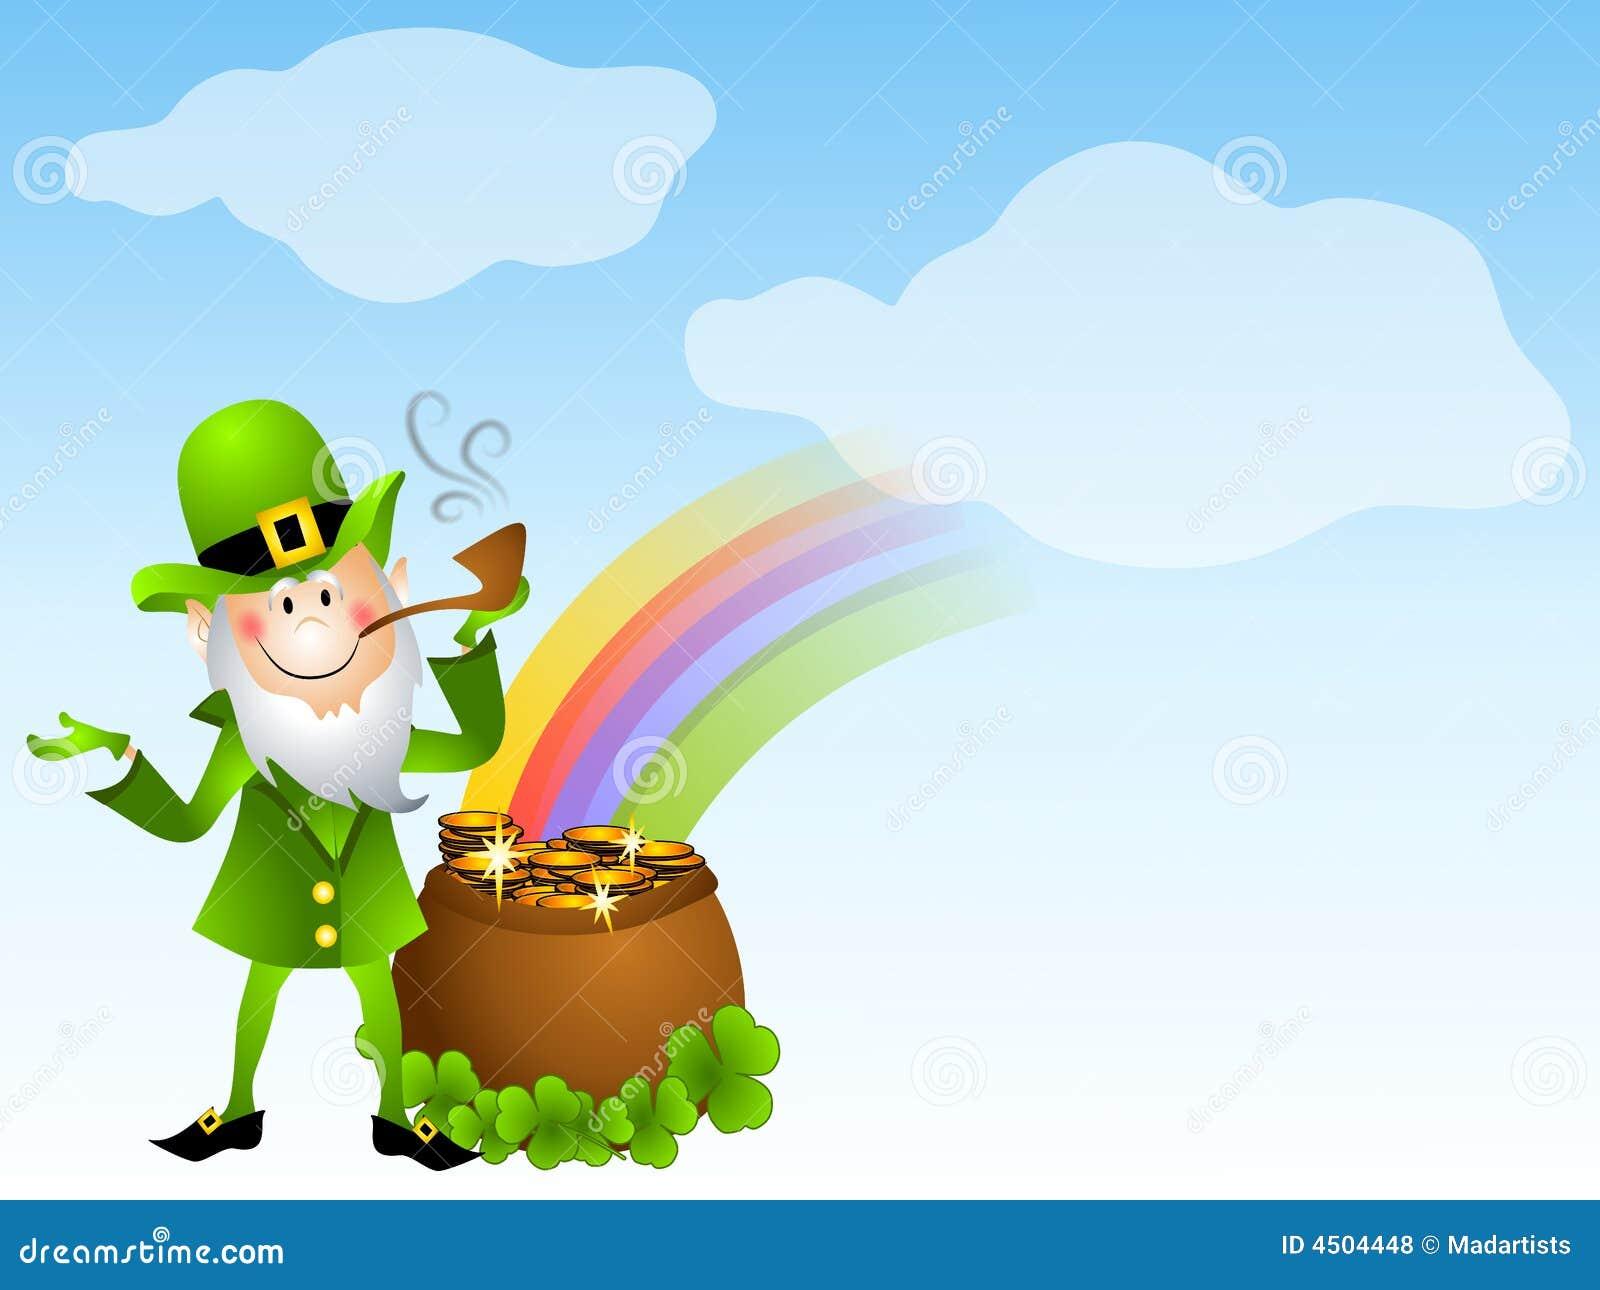 Uncategorized Leprechauns And Rainbows leprechaun and pot of gold royalty free stock photos image 4504448 photo